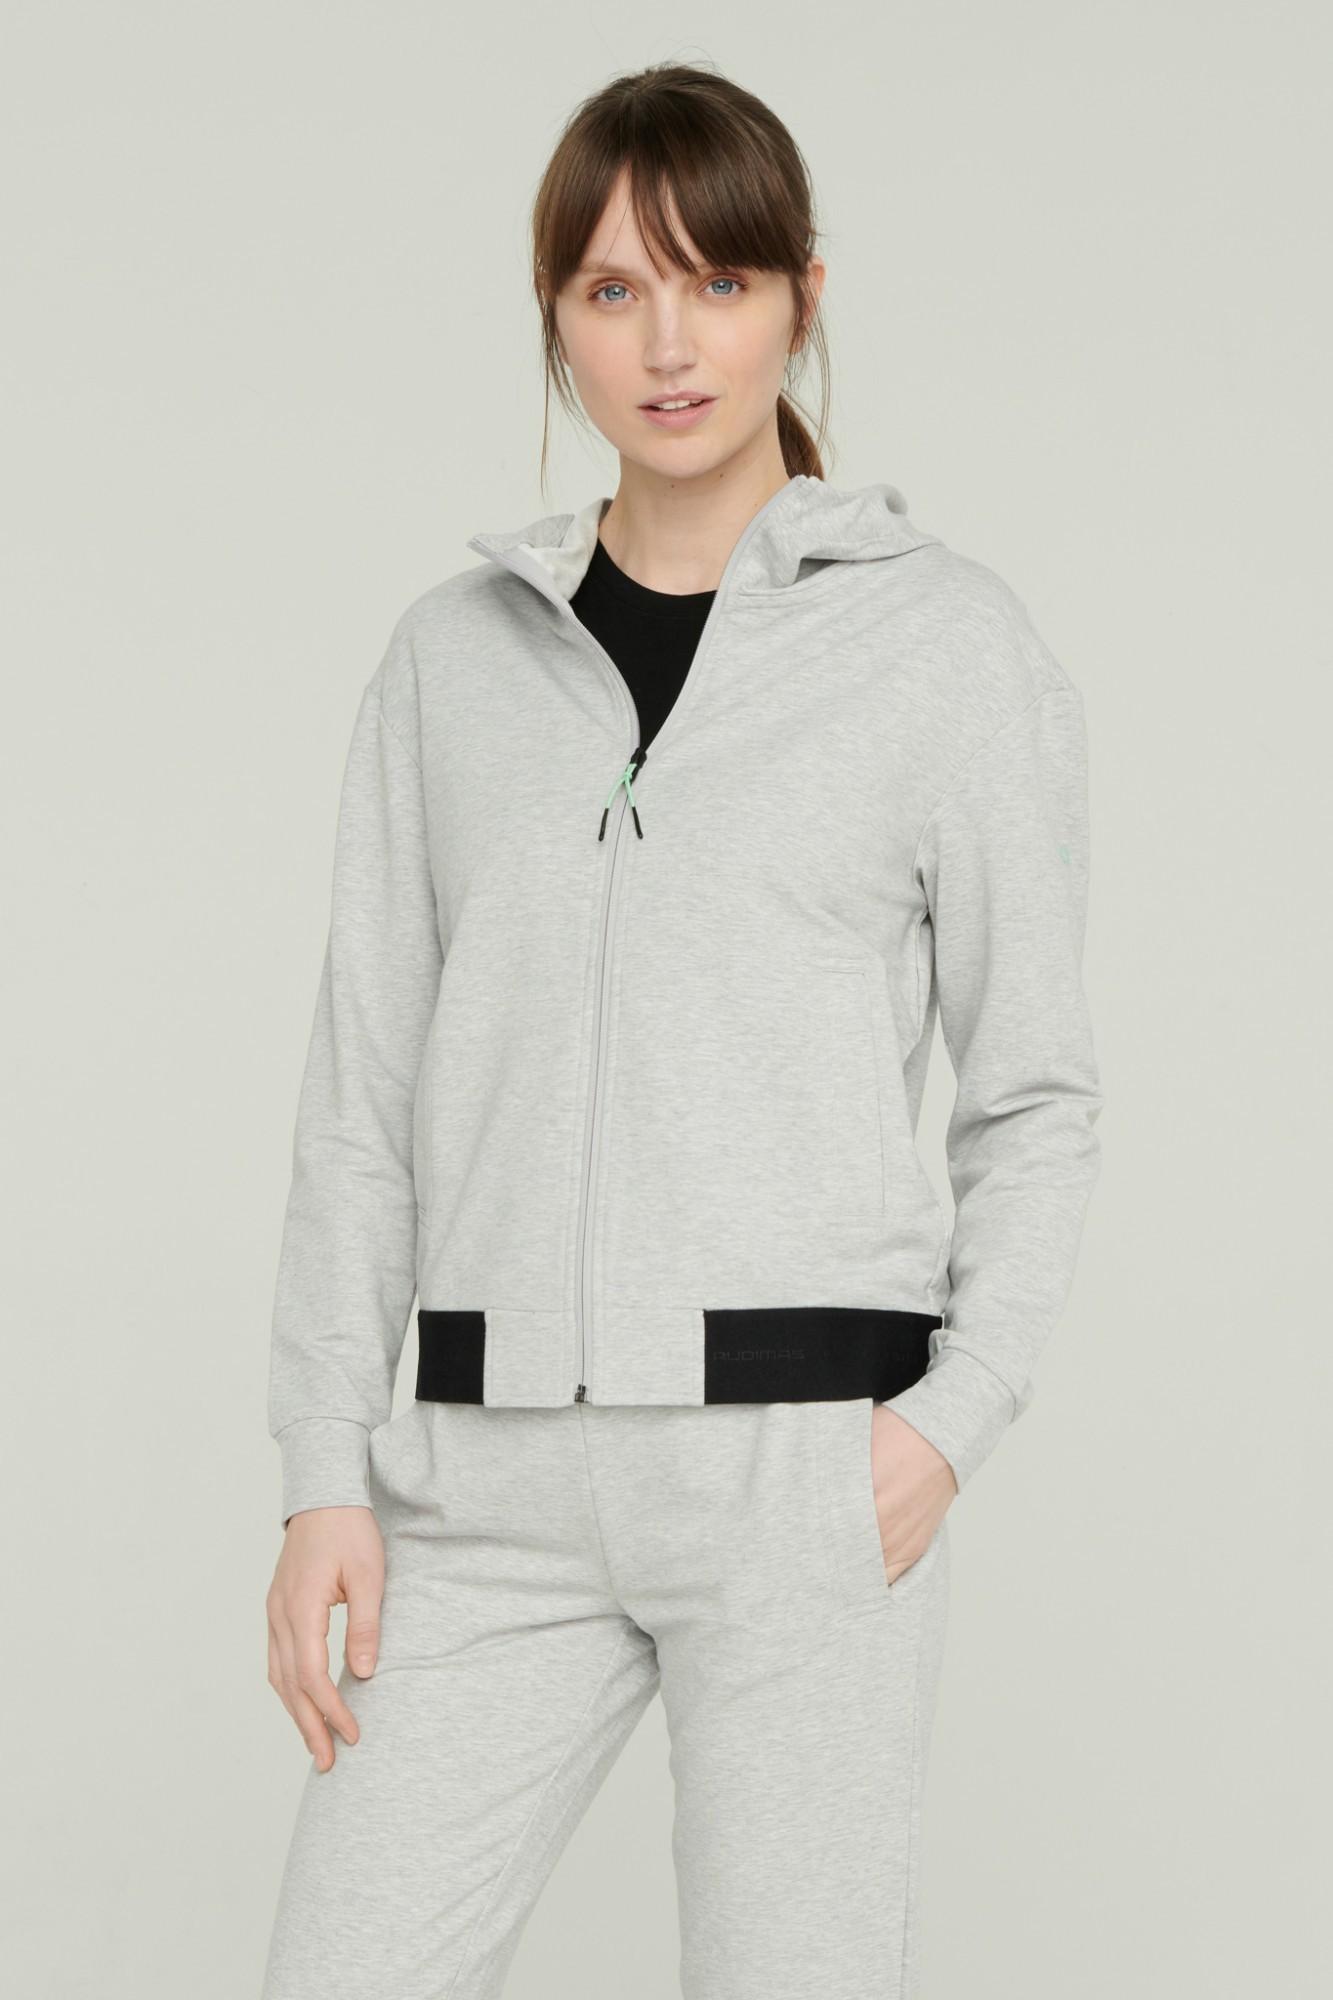 AUDIMAS Atsegamas džemperis su gobtuvu 2111-057 High Rise Melange XL